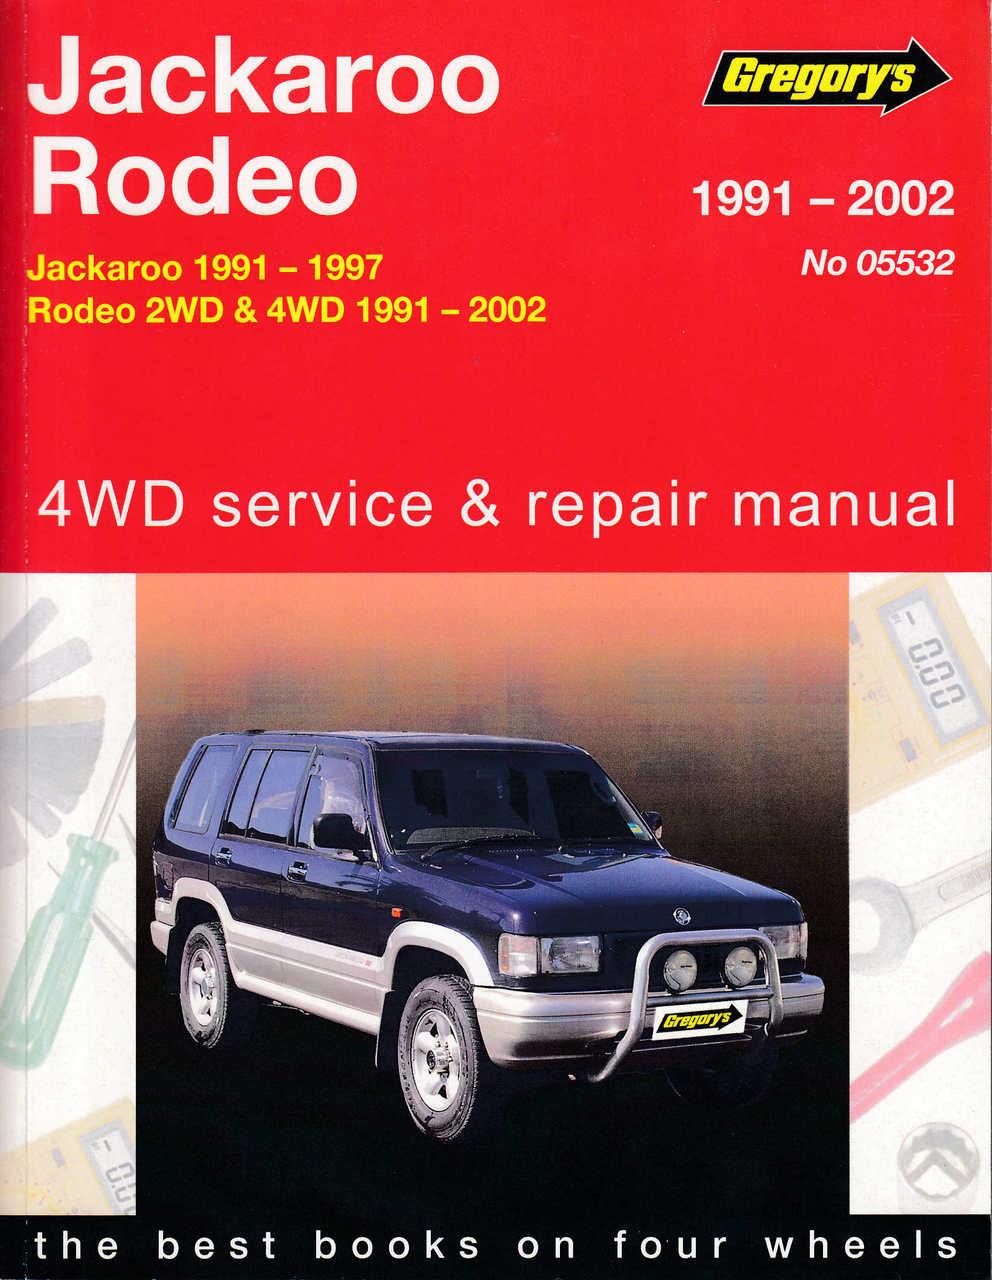 holden jackaroo and holden rodeo 1991 2002 workshop manual rh  automotobookshop com au Snowblower Repair Manuals Honda Service Repair  Manual